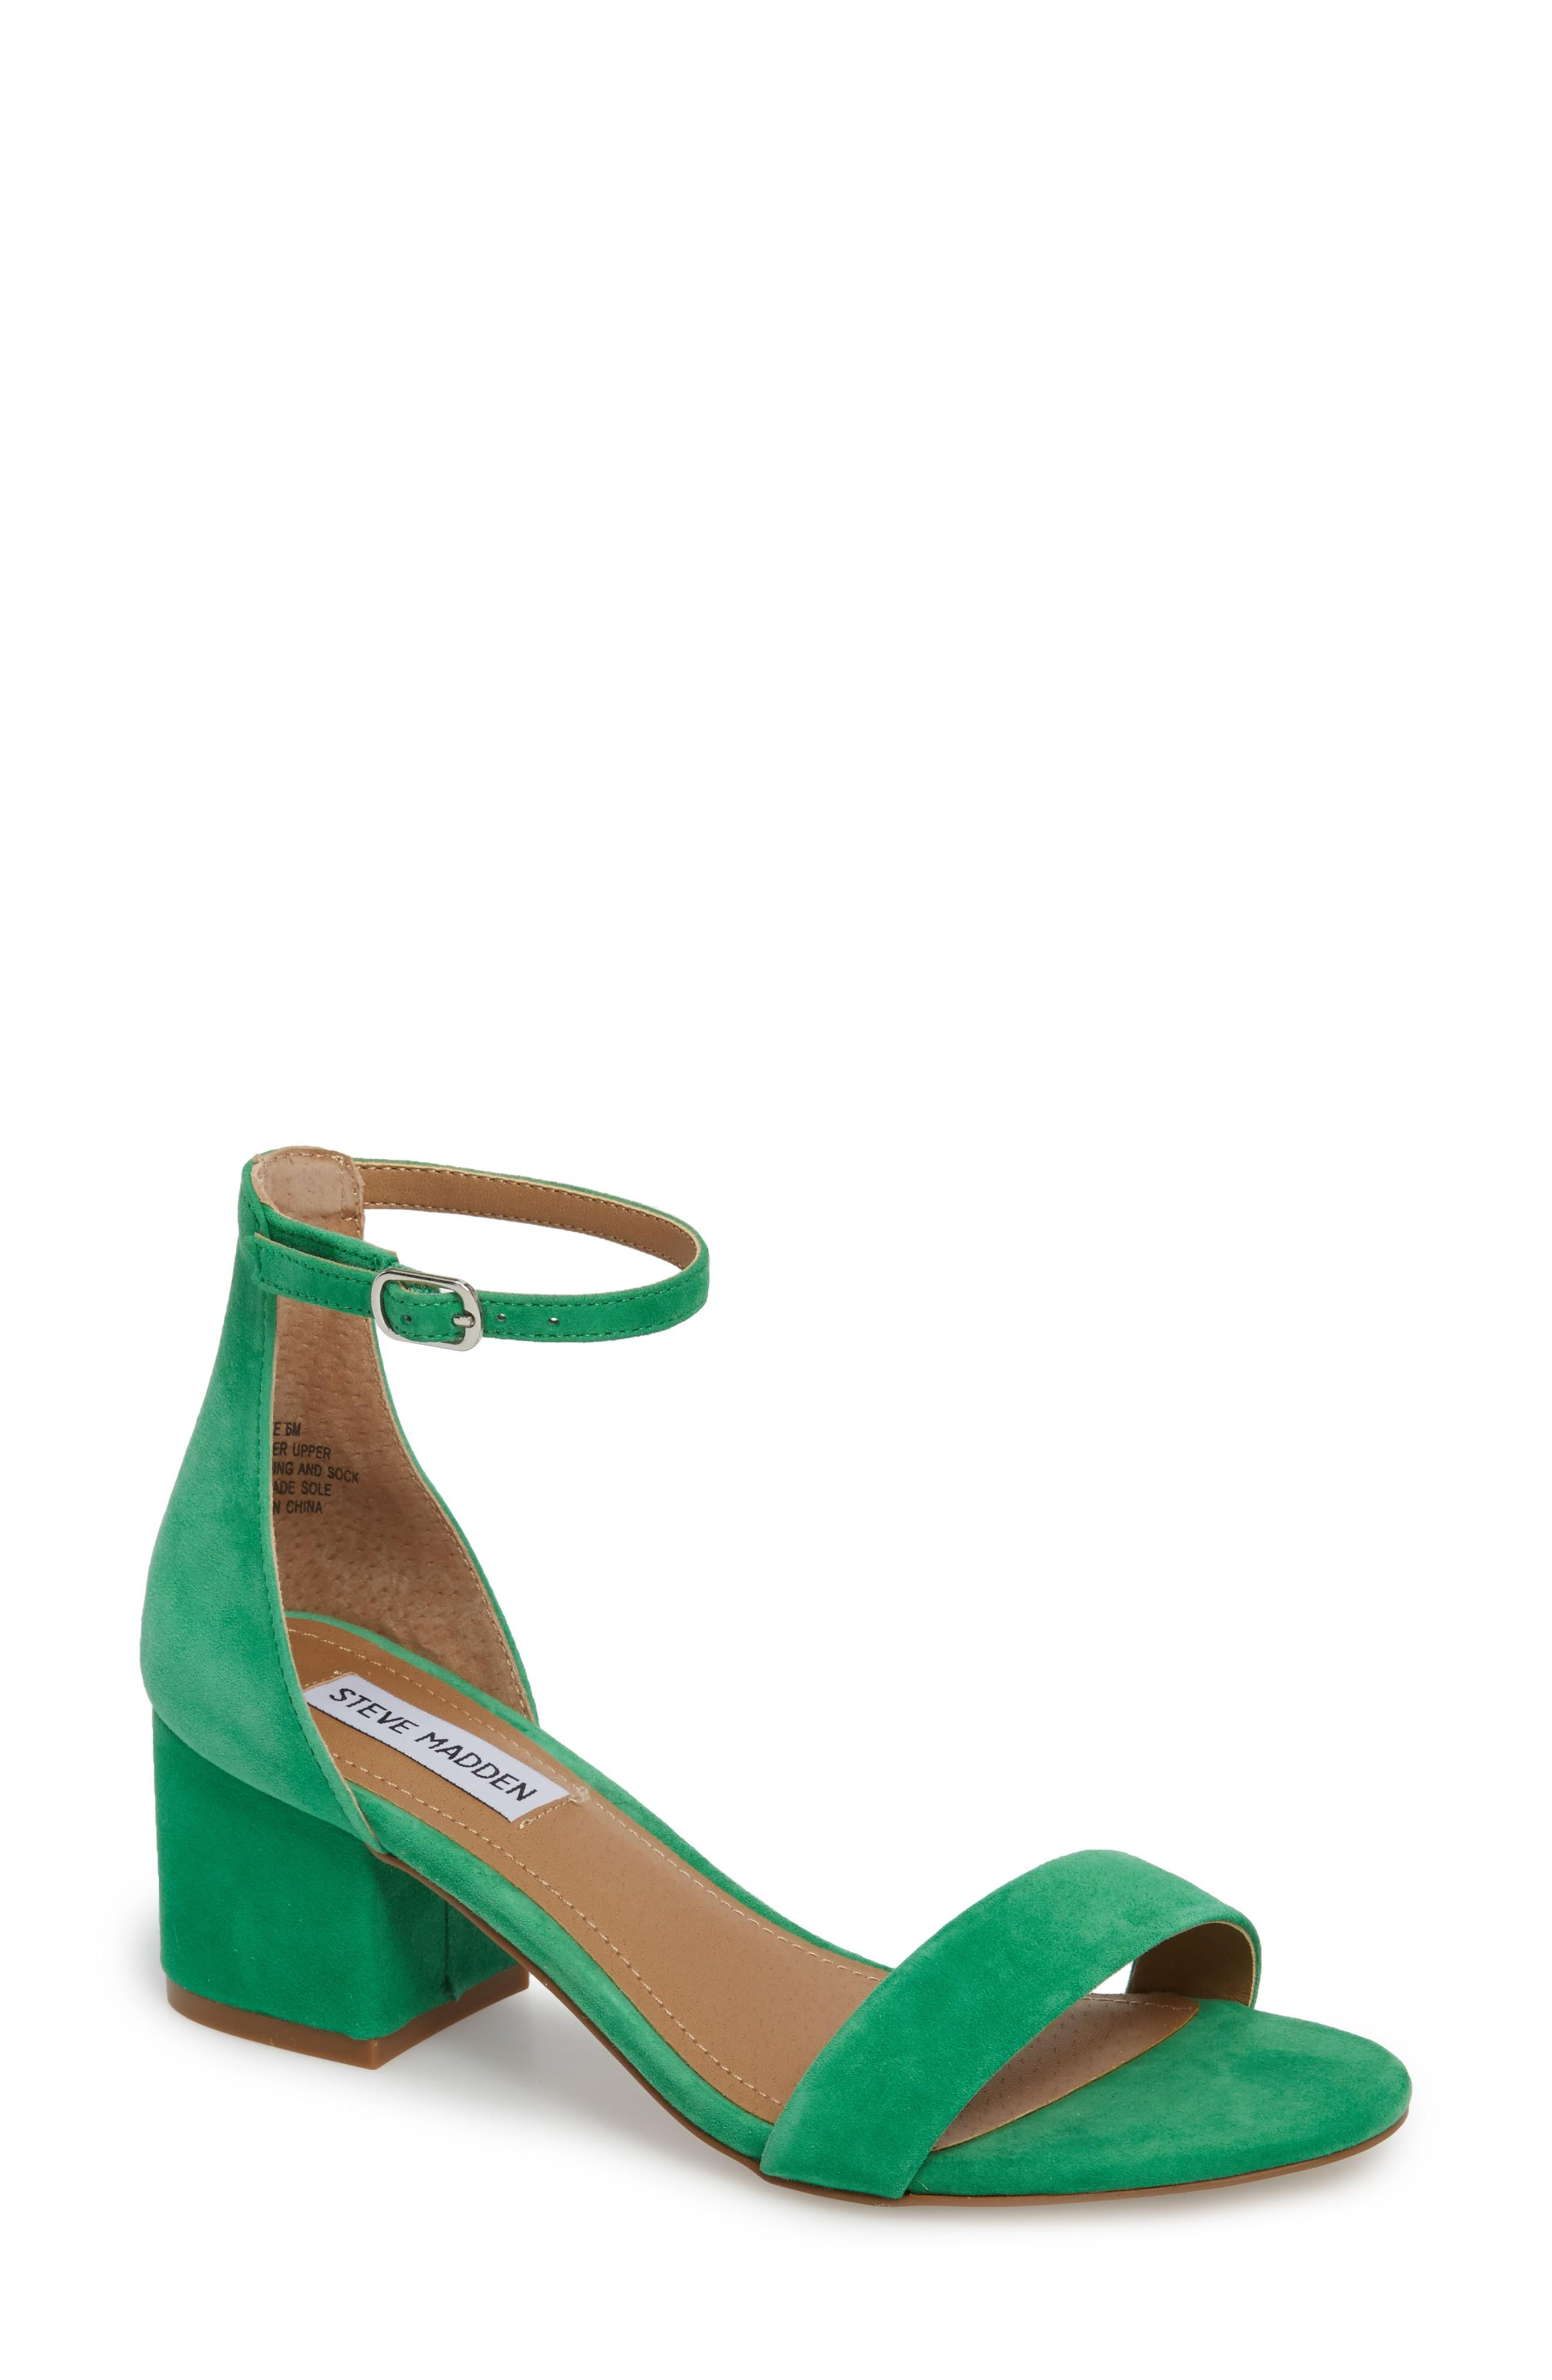 62f300dd5d Steve Madden Irenee Ankle Strap Sandal In Green Suede | ModeSens